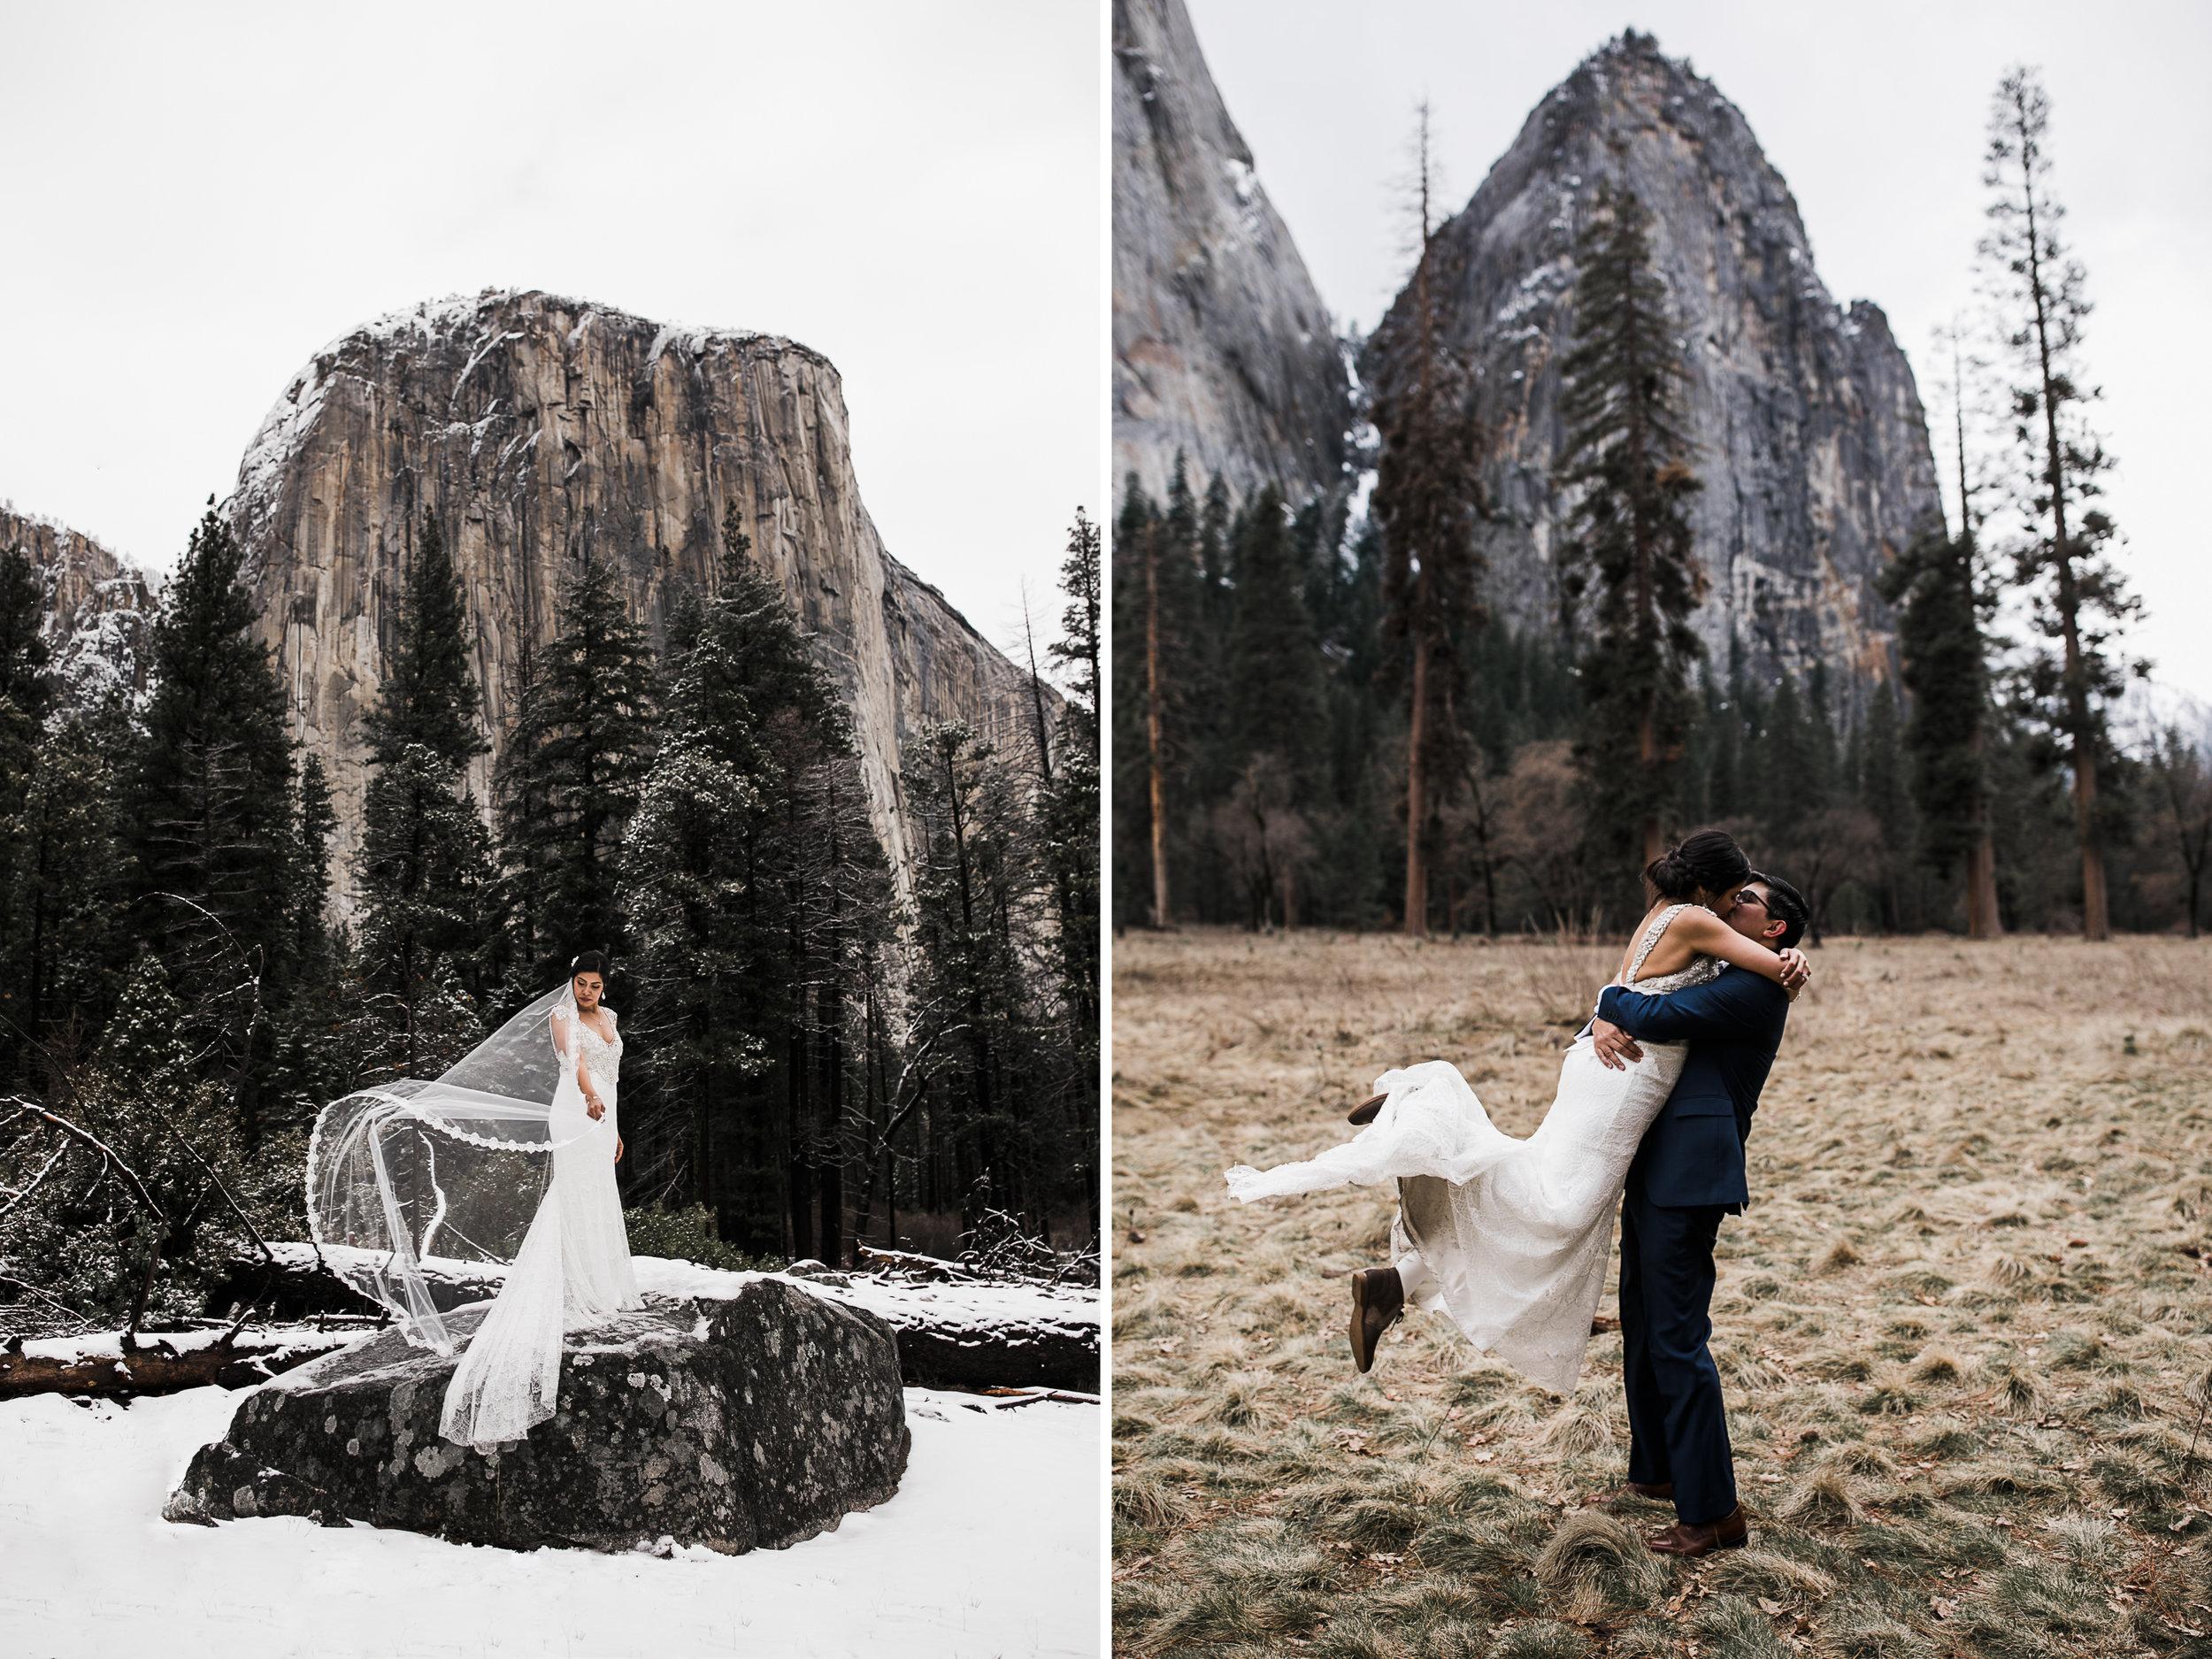 snowy wedding in yosemite national park